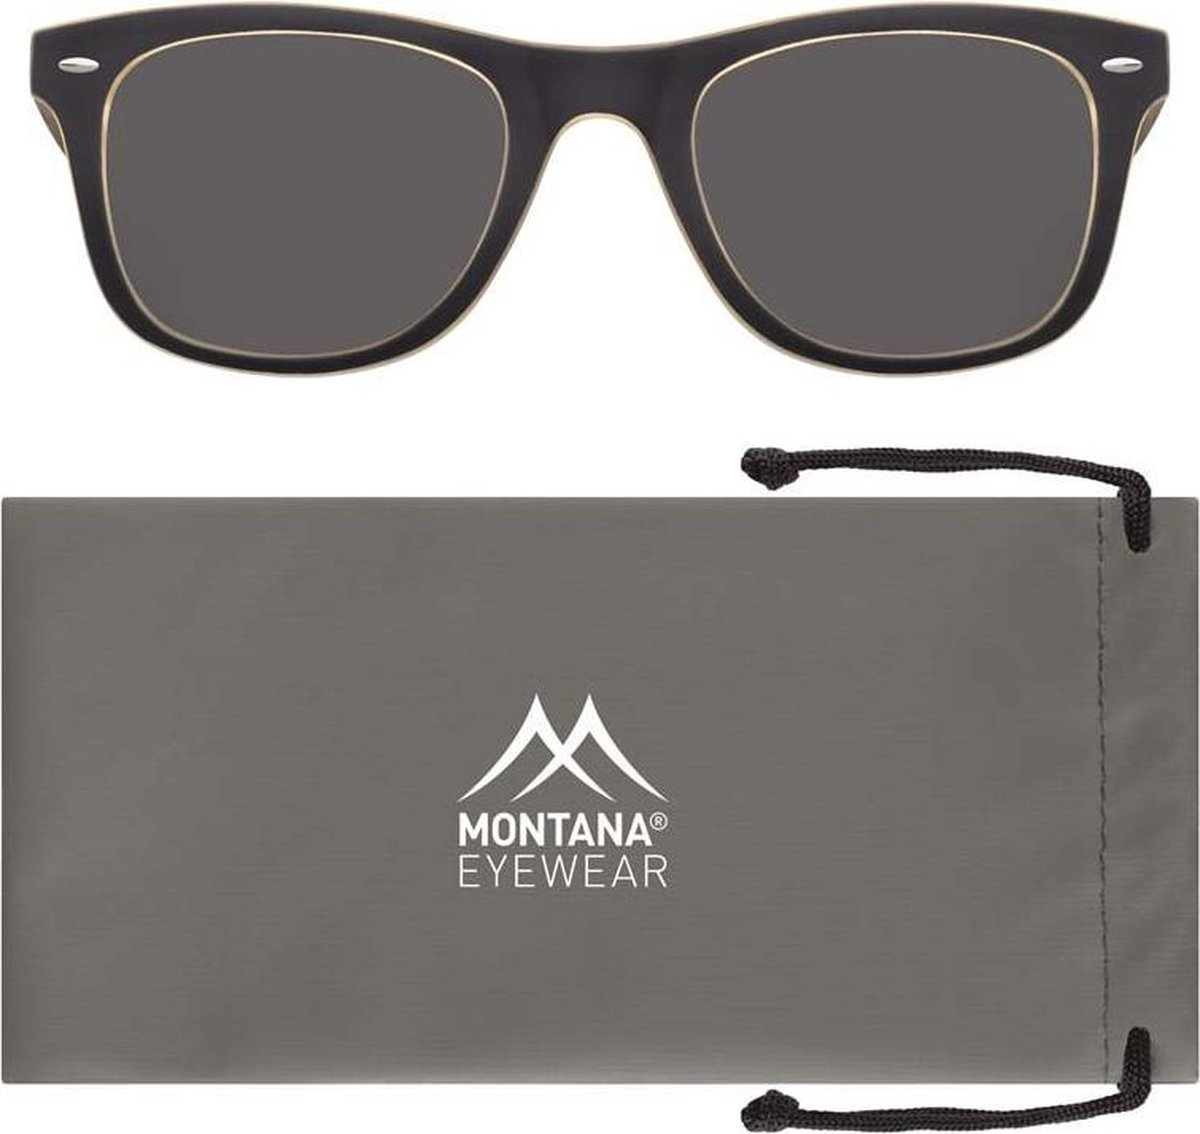 Montana MP42D Zonnebril New Wayfarer style Zwart en Grijs Lensbreedte 50 mm